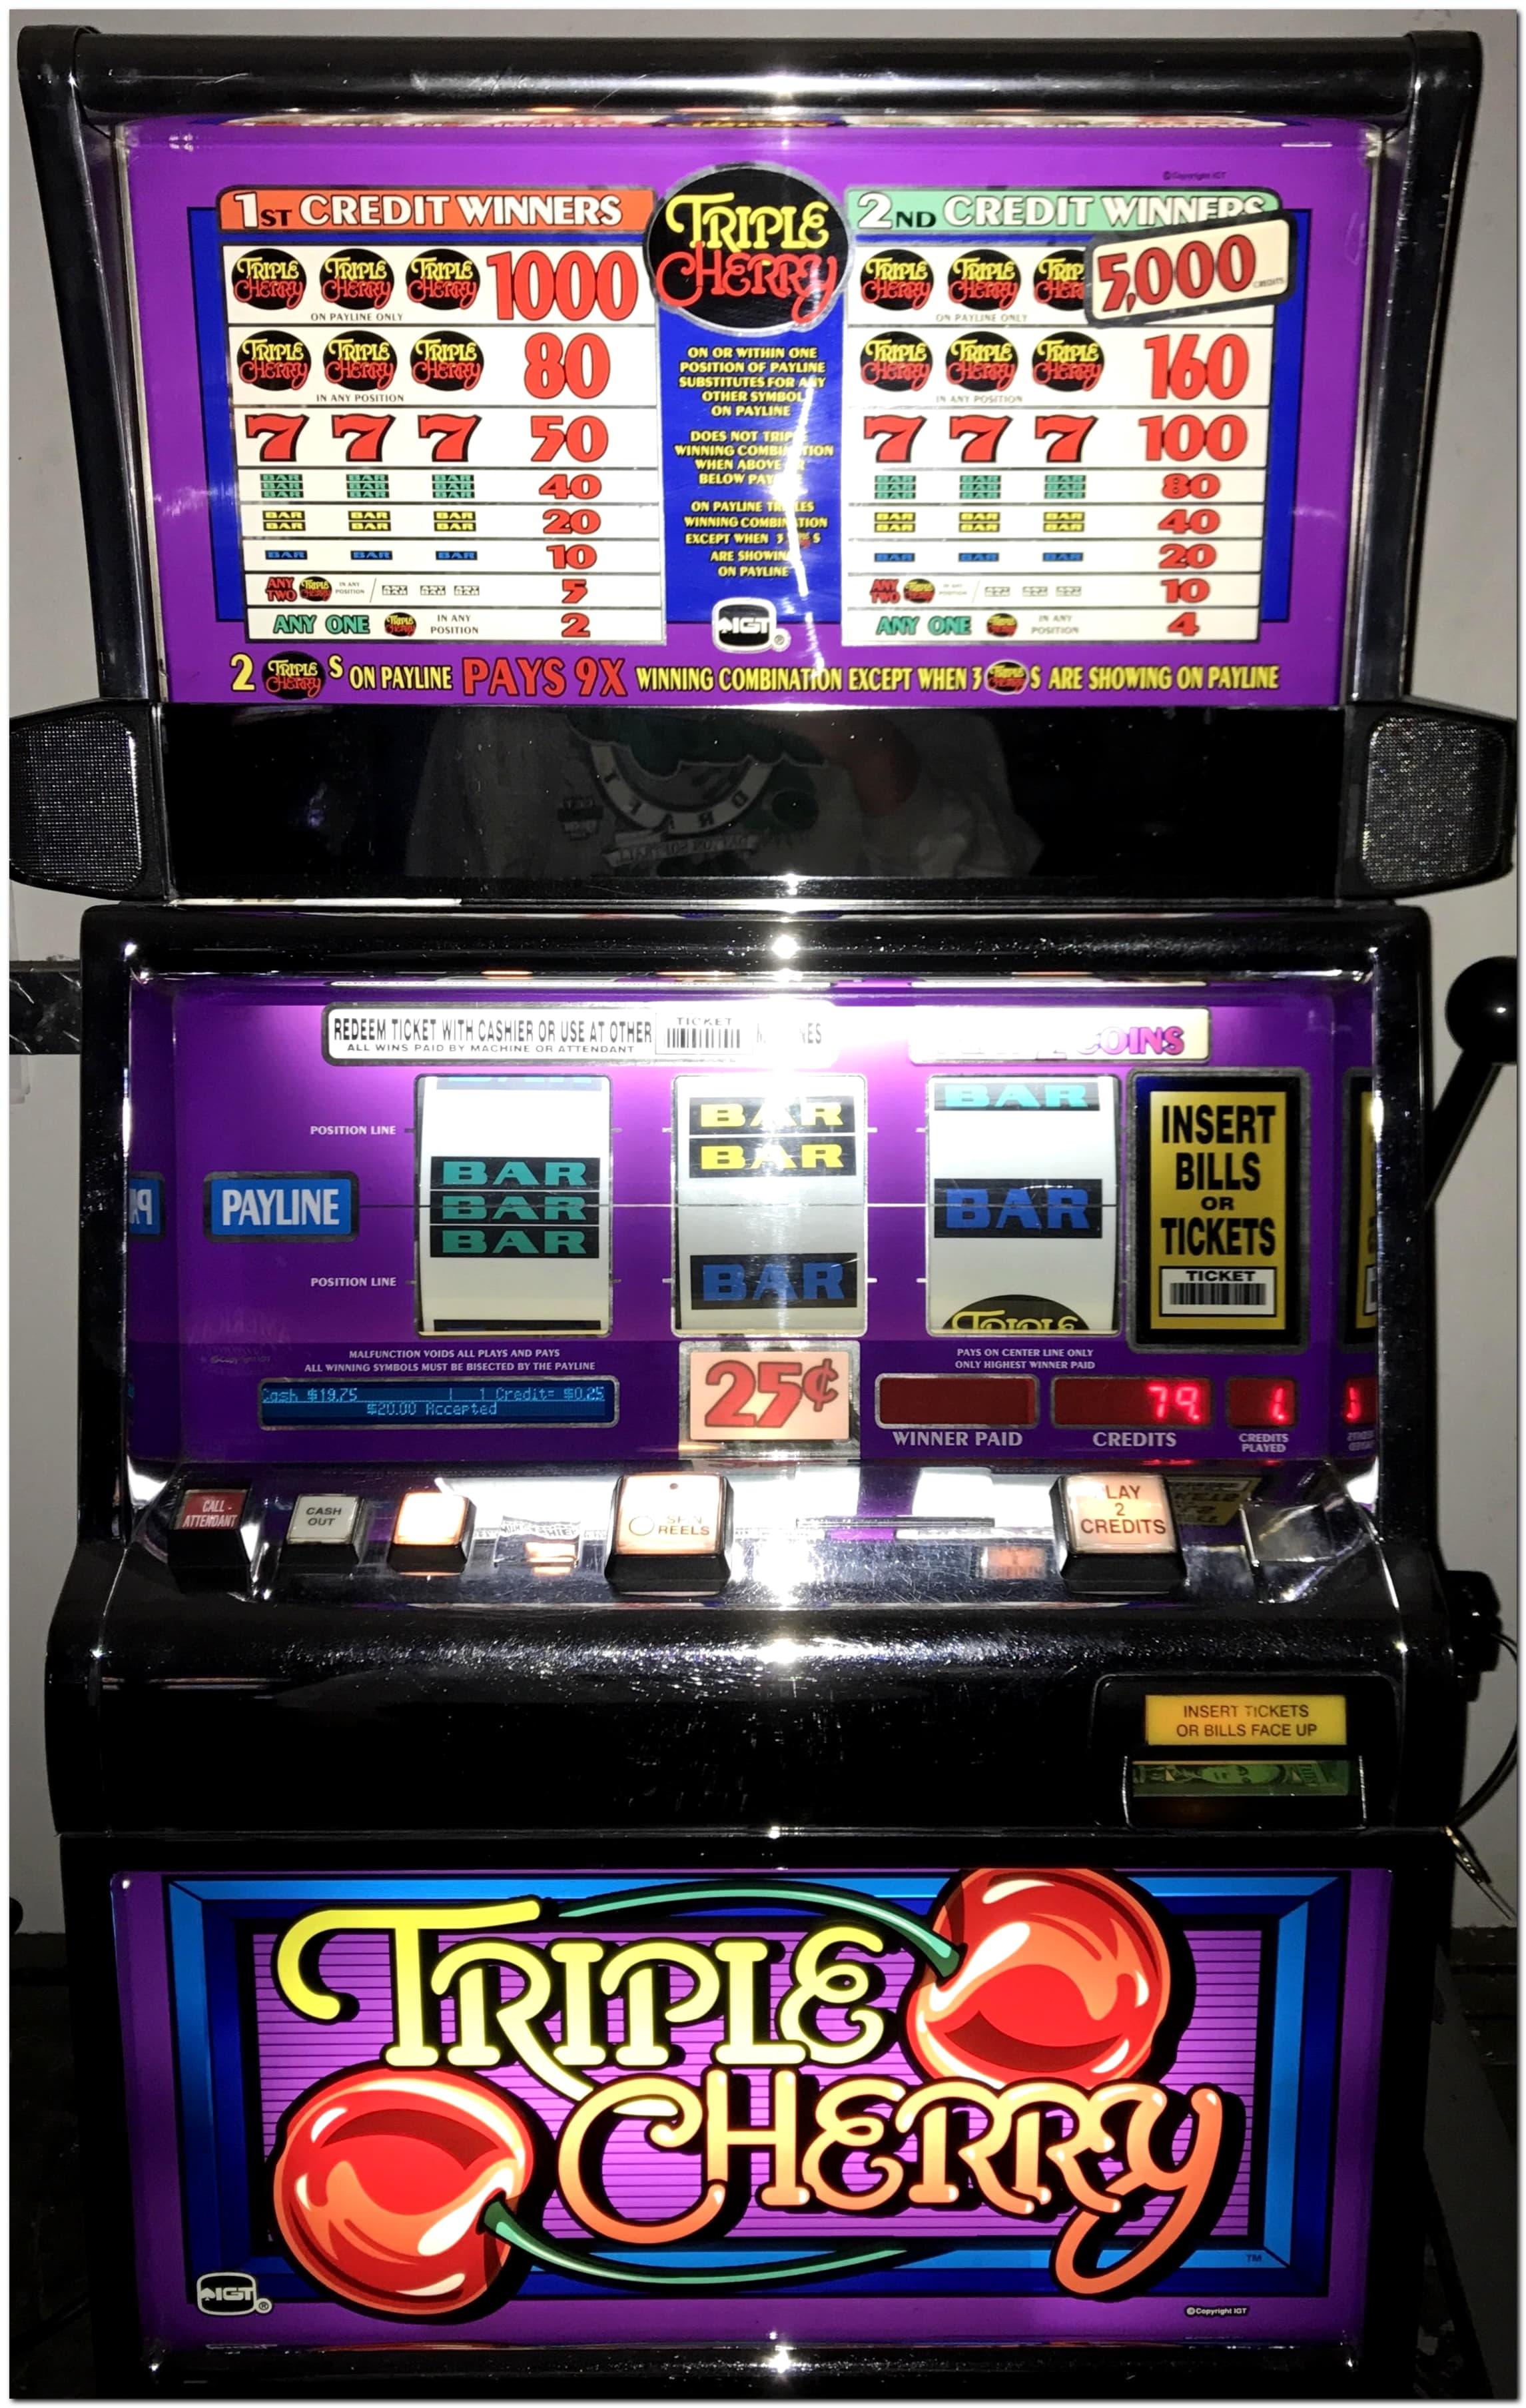 Leo VegasカジノでのEURO 135カジノトーナメント